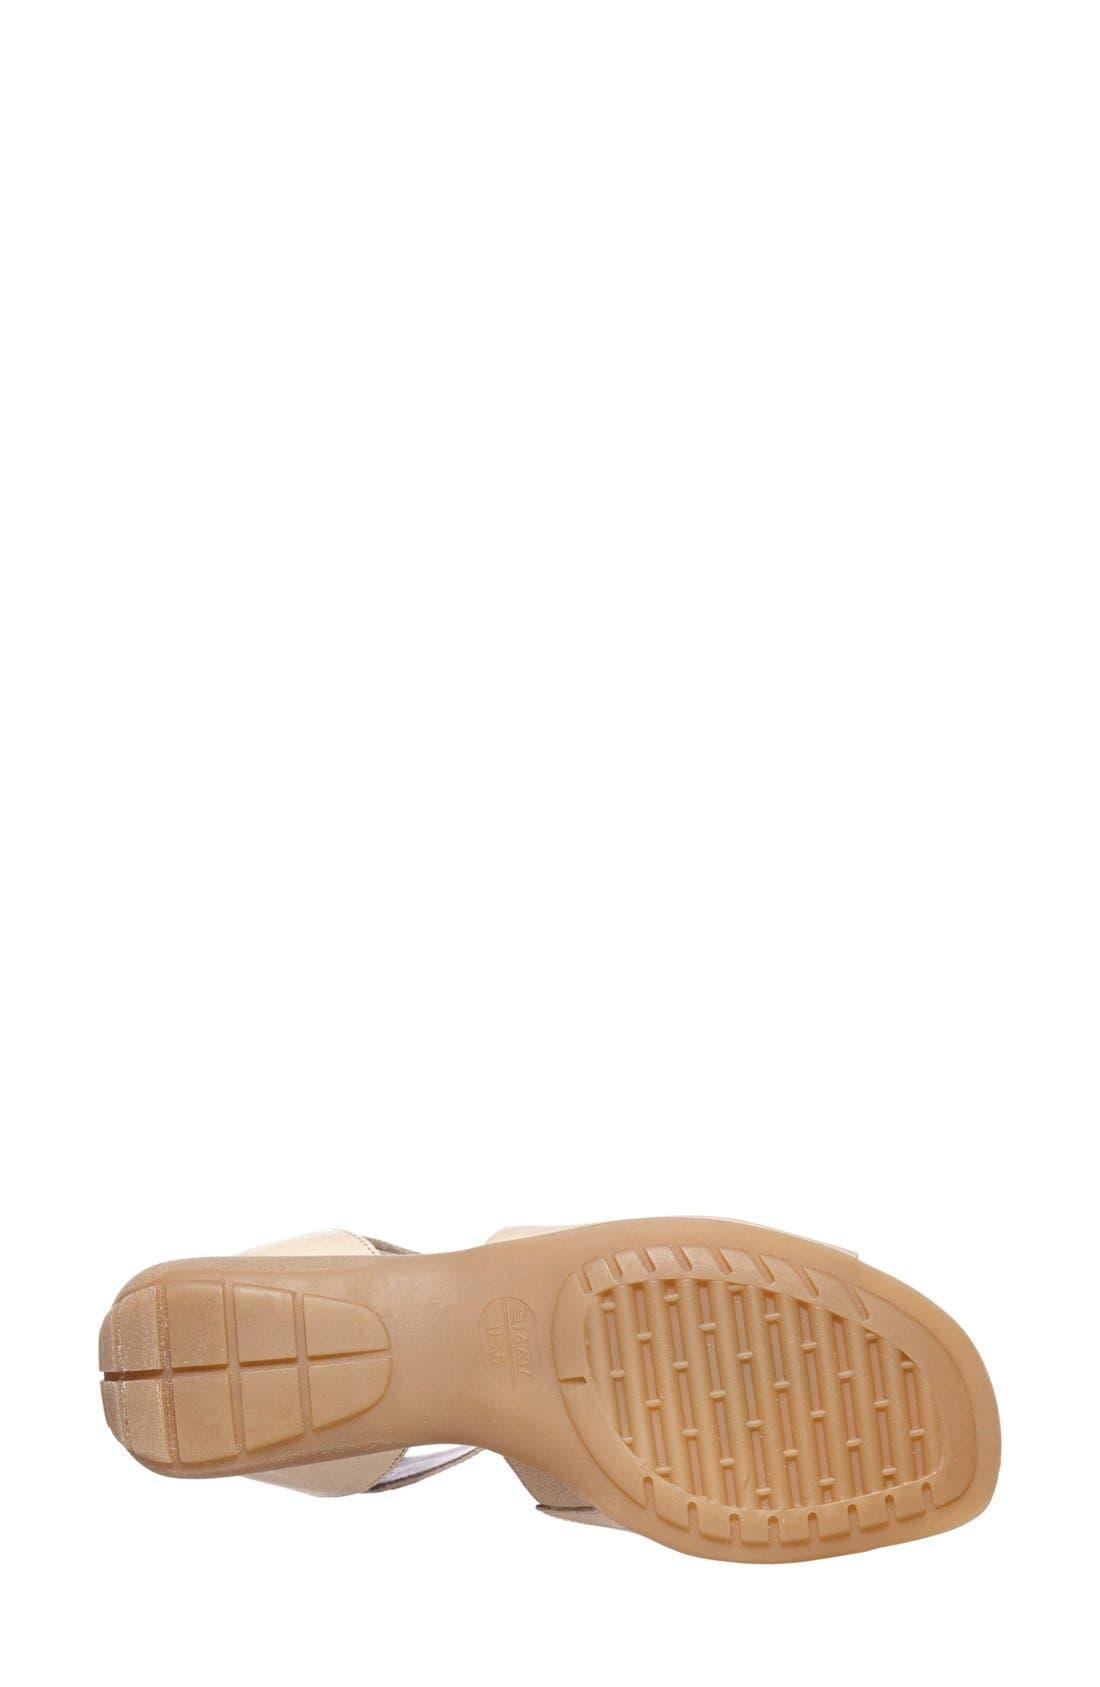 'Beglad' Leather Ankle Strap Sandal,                             Alternate thumbnail 62, color,